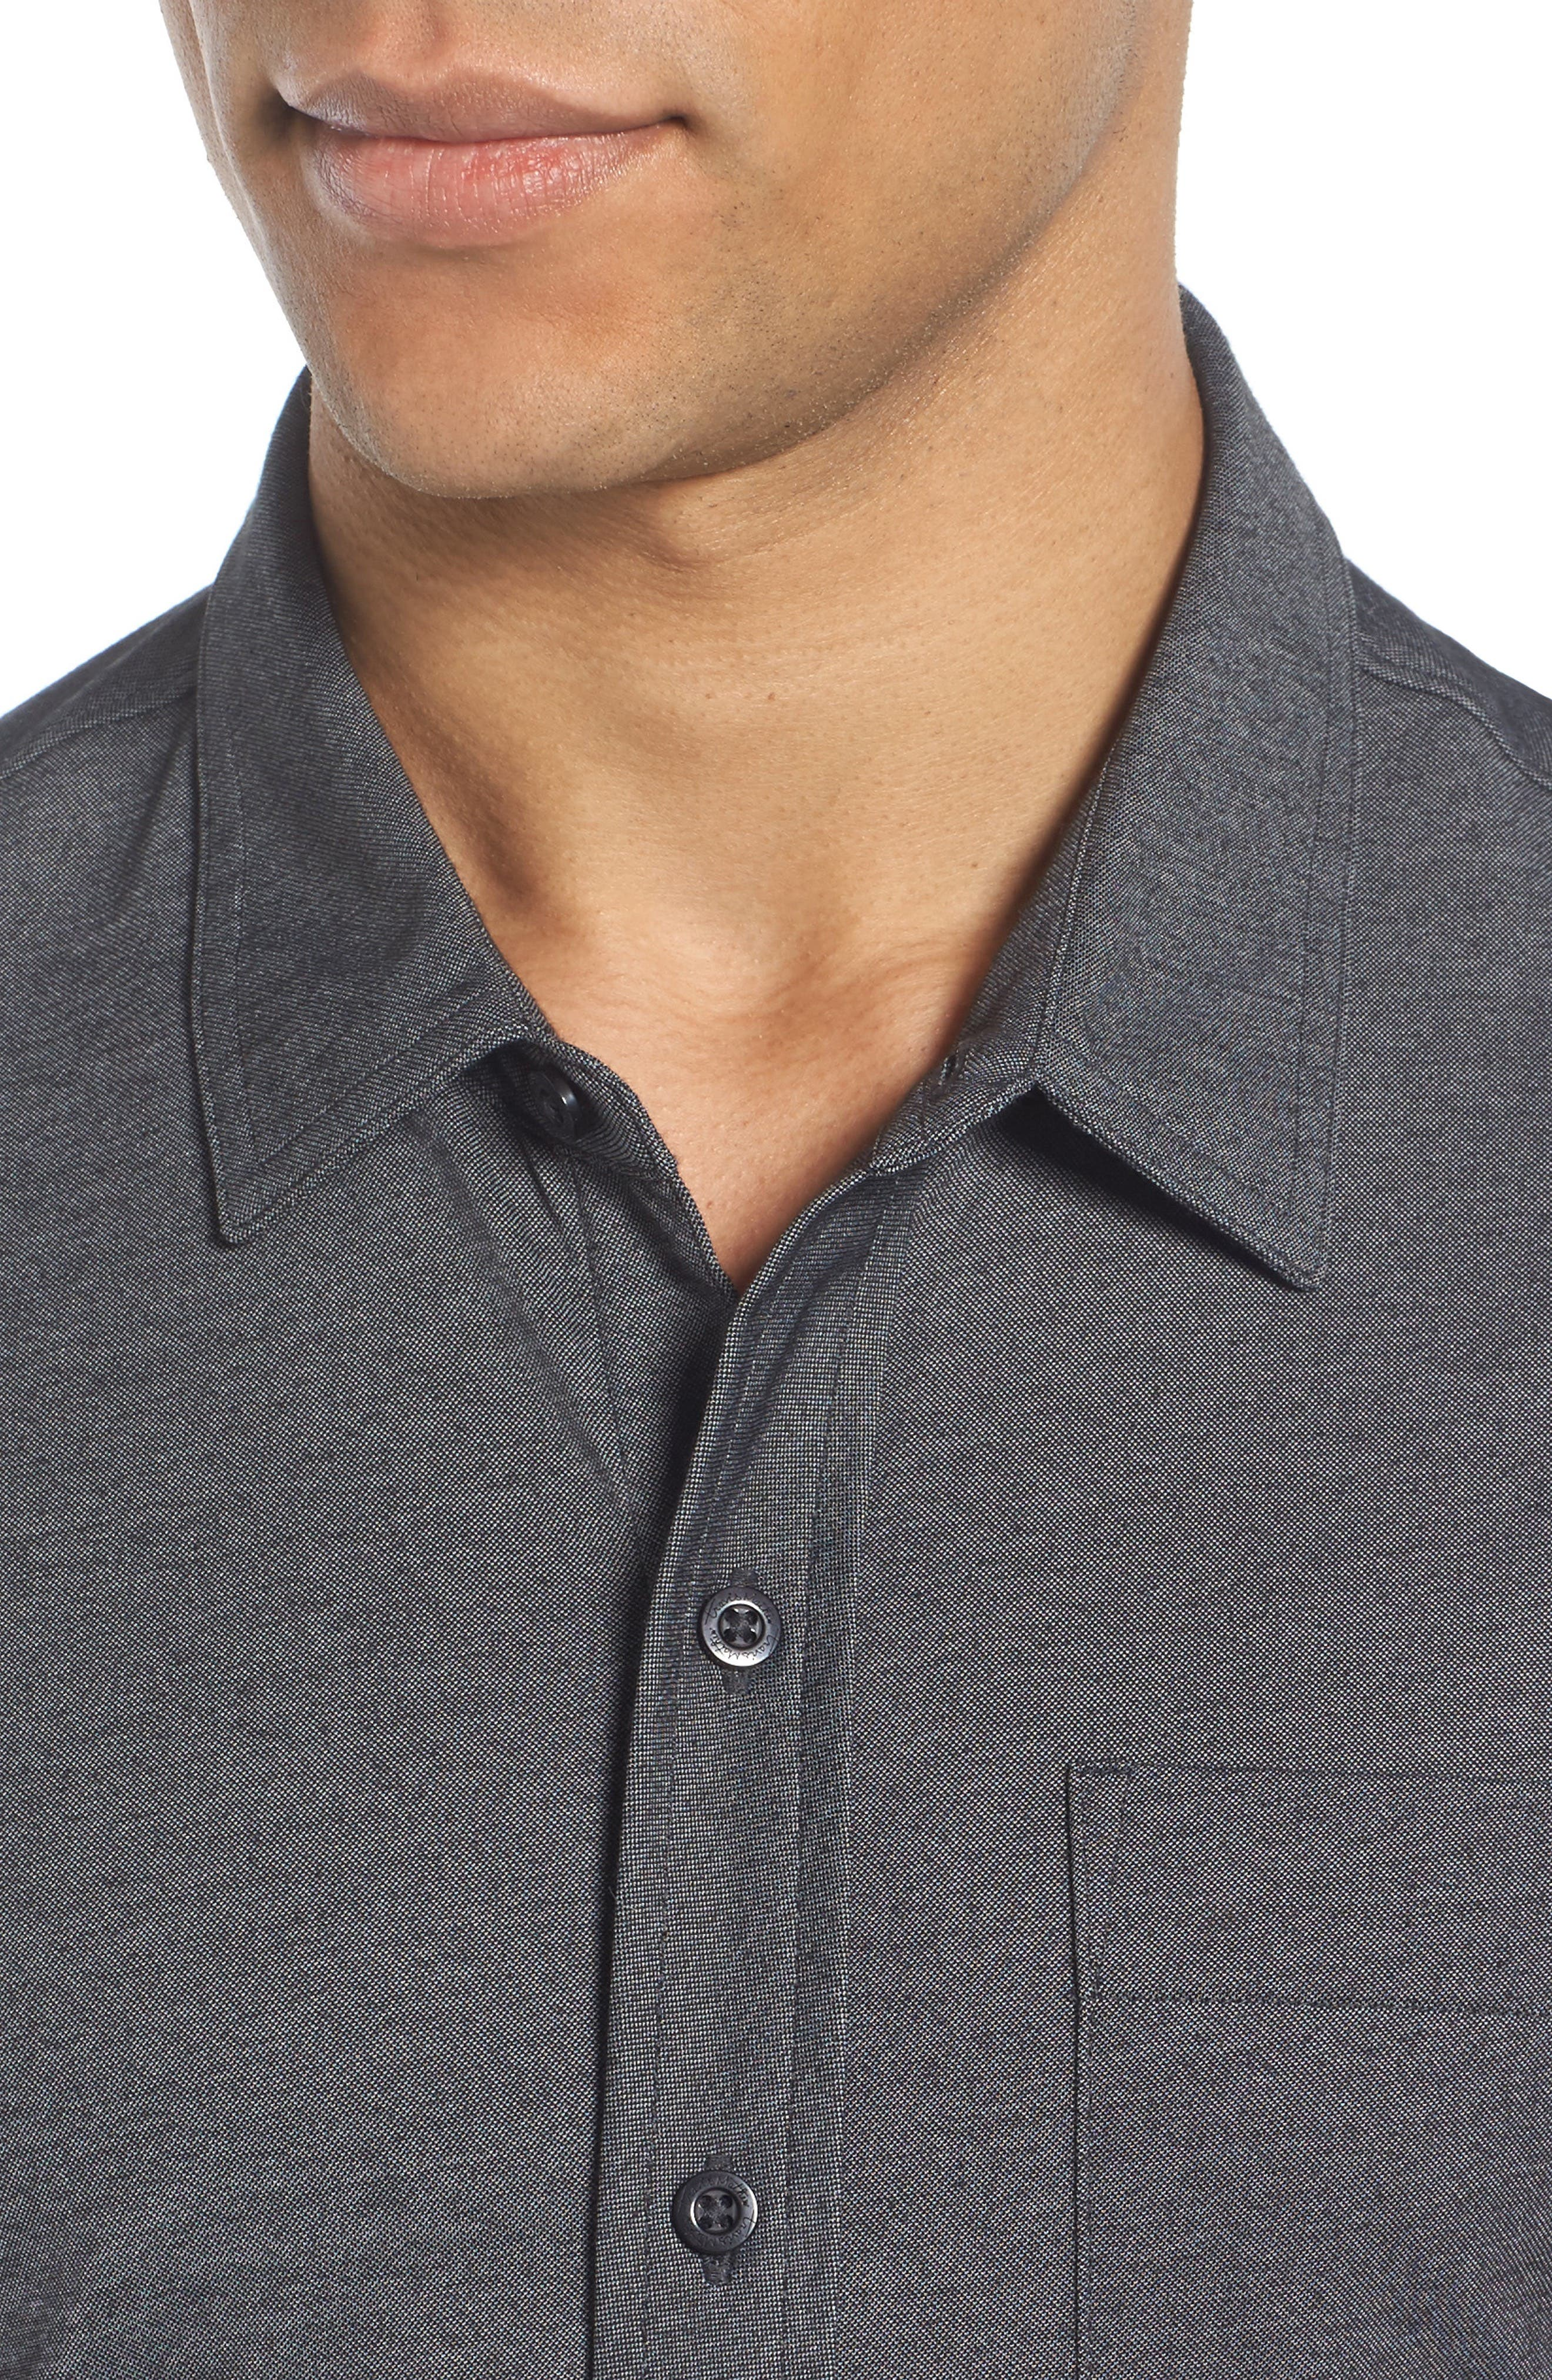 Trip'Slim Fit Wrinkle Free Sport Shirt,                             Alternate thumbnail 4, color,                             001